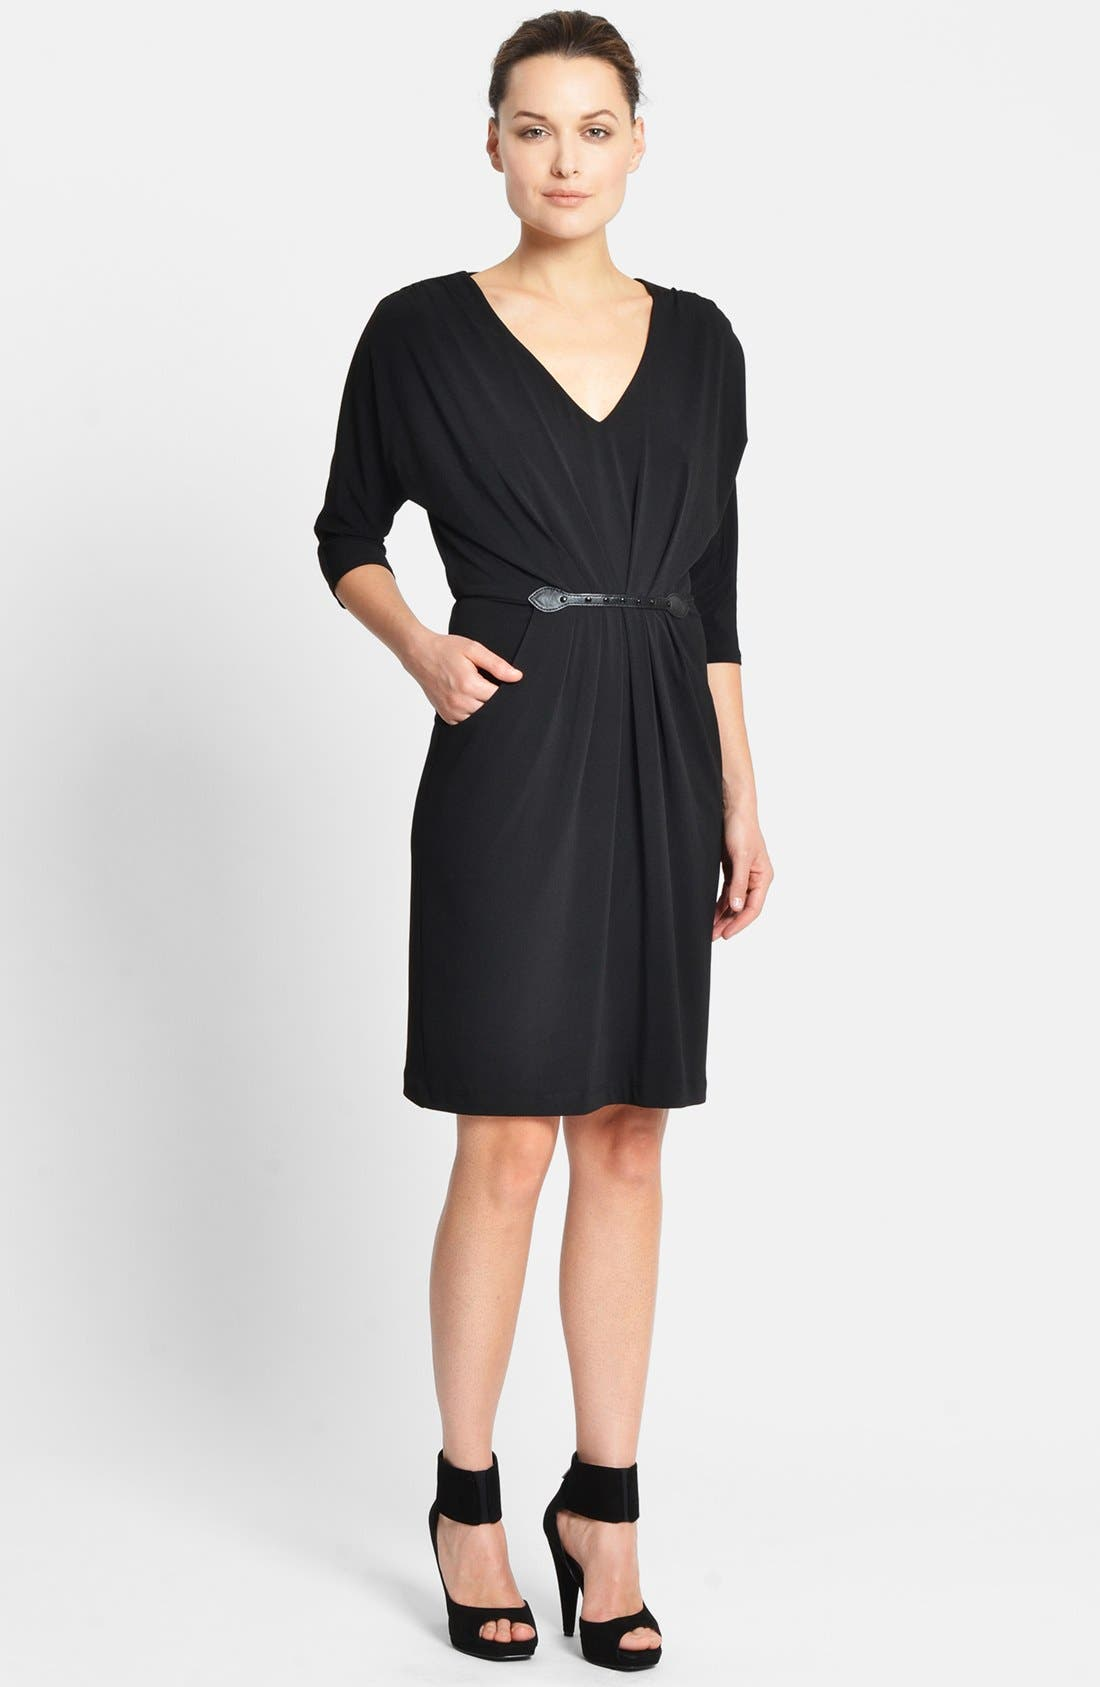 Alternate Image 1 Selected - Catherine Catherine Malandrino Dolman Sleeve Dress